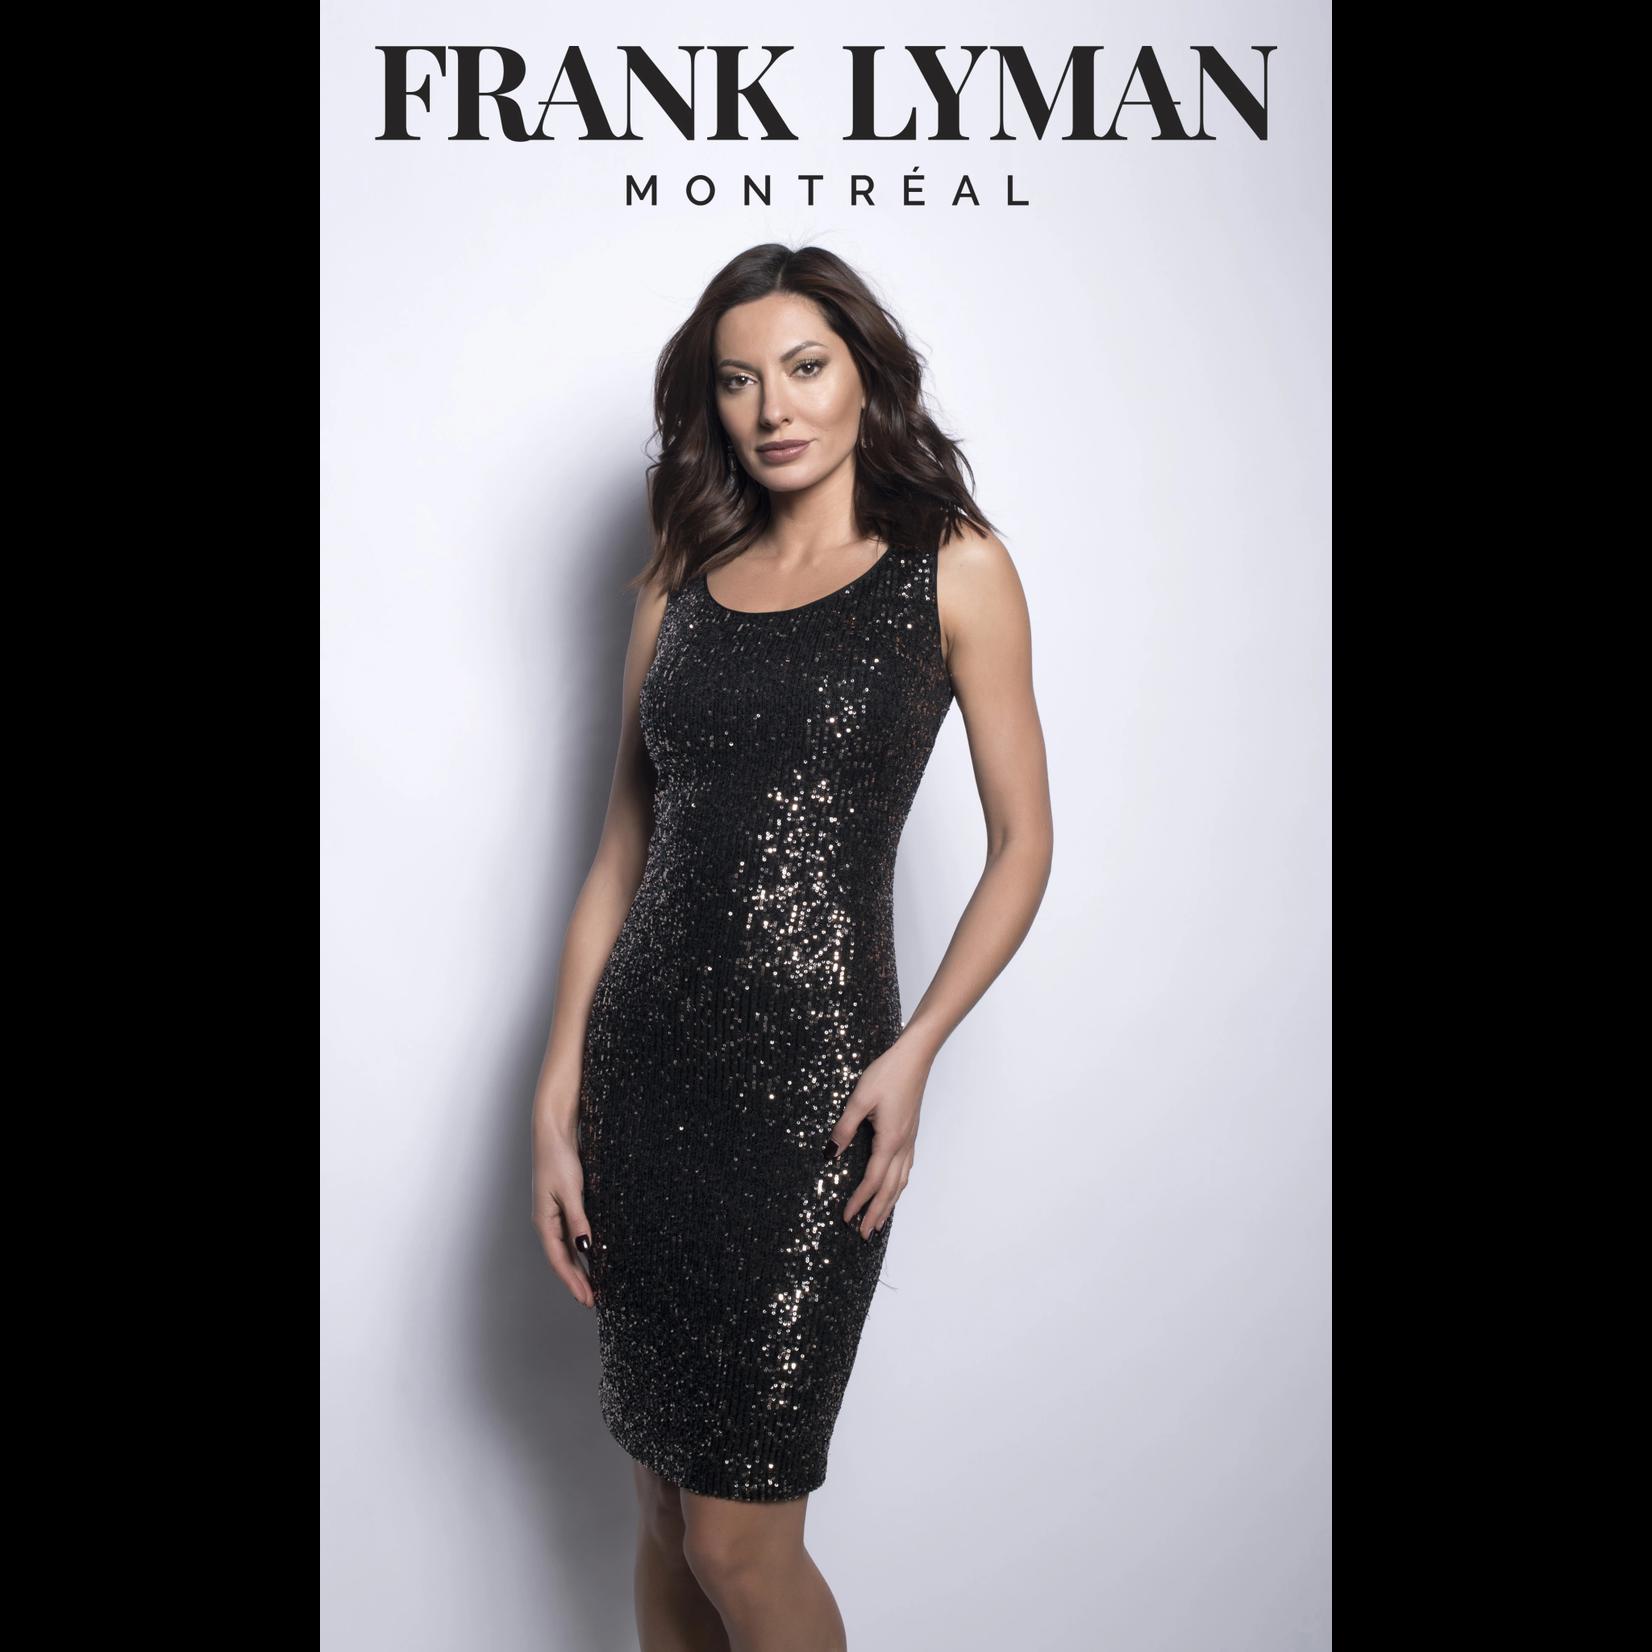 Frank Lyman Bronze/Black Woven Sequin Dress